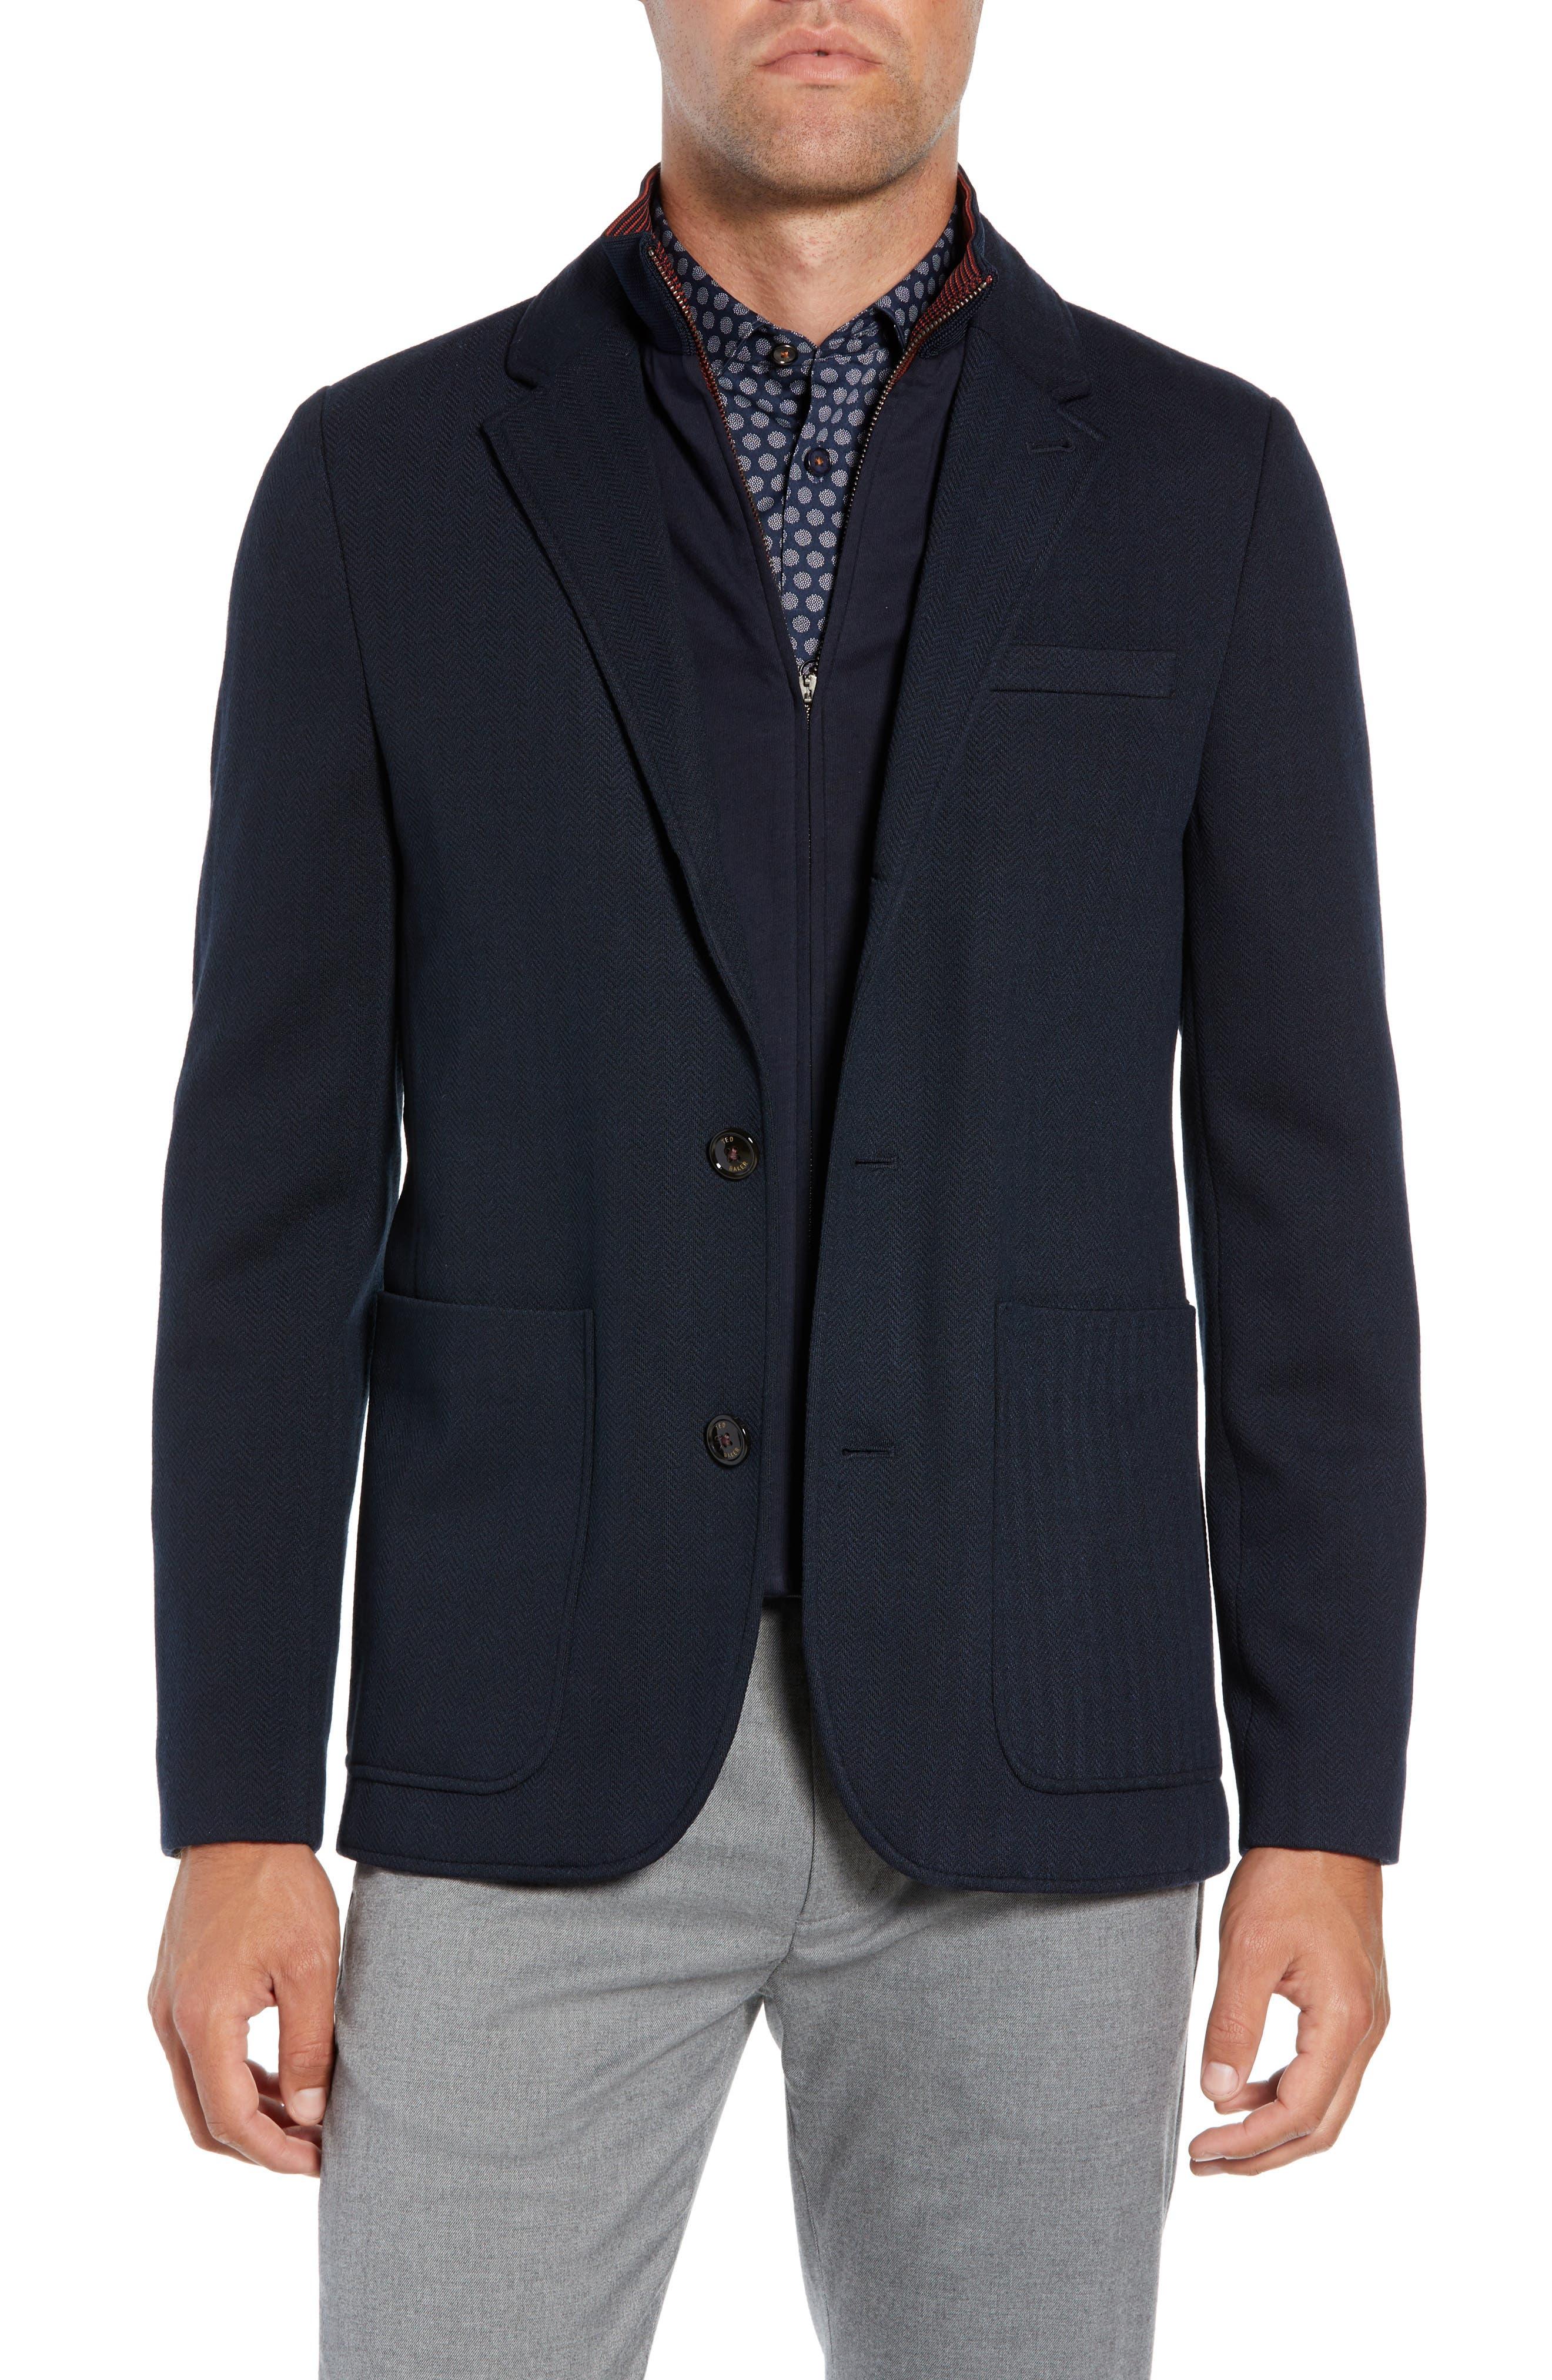 Glenny Slim Fit Layered Look Blazer,                         Main,                         color, NAVY